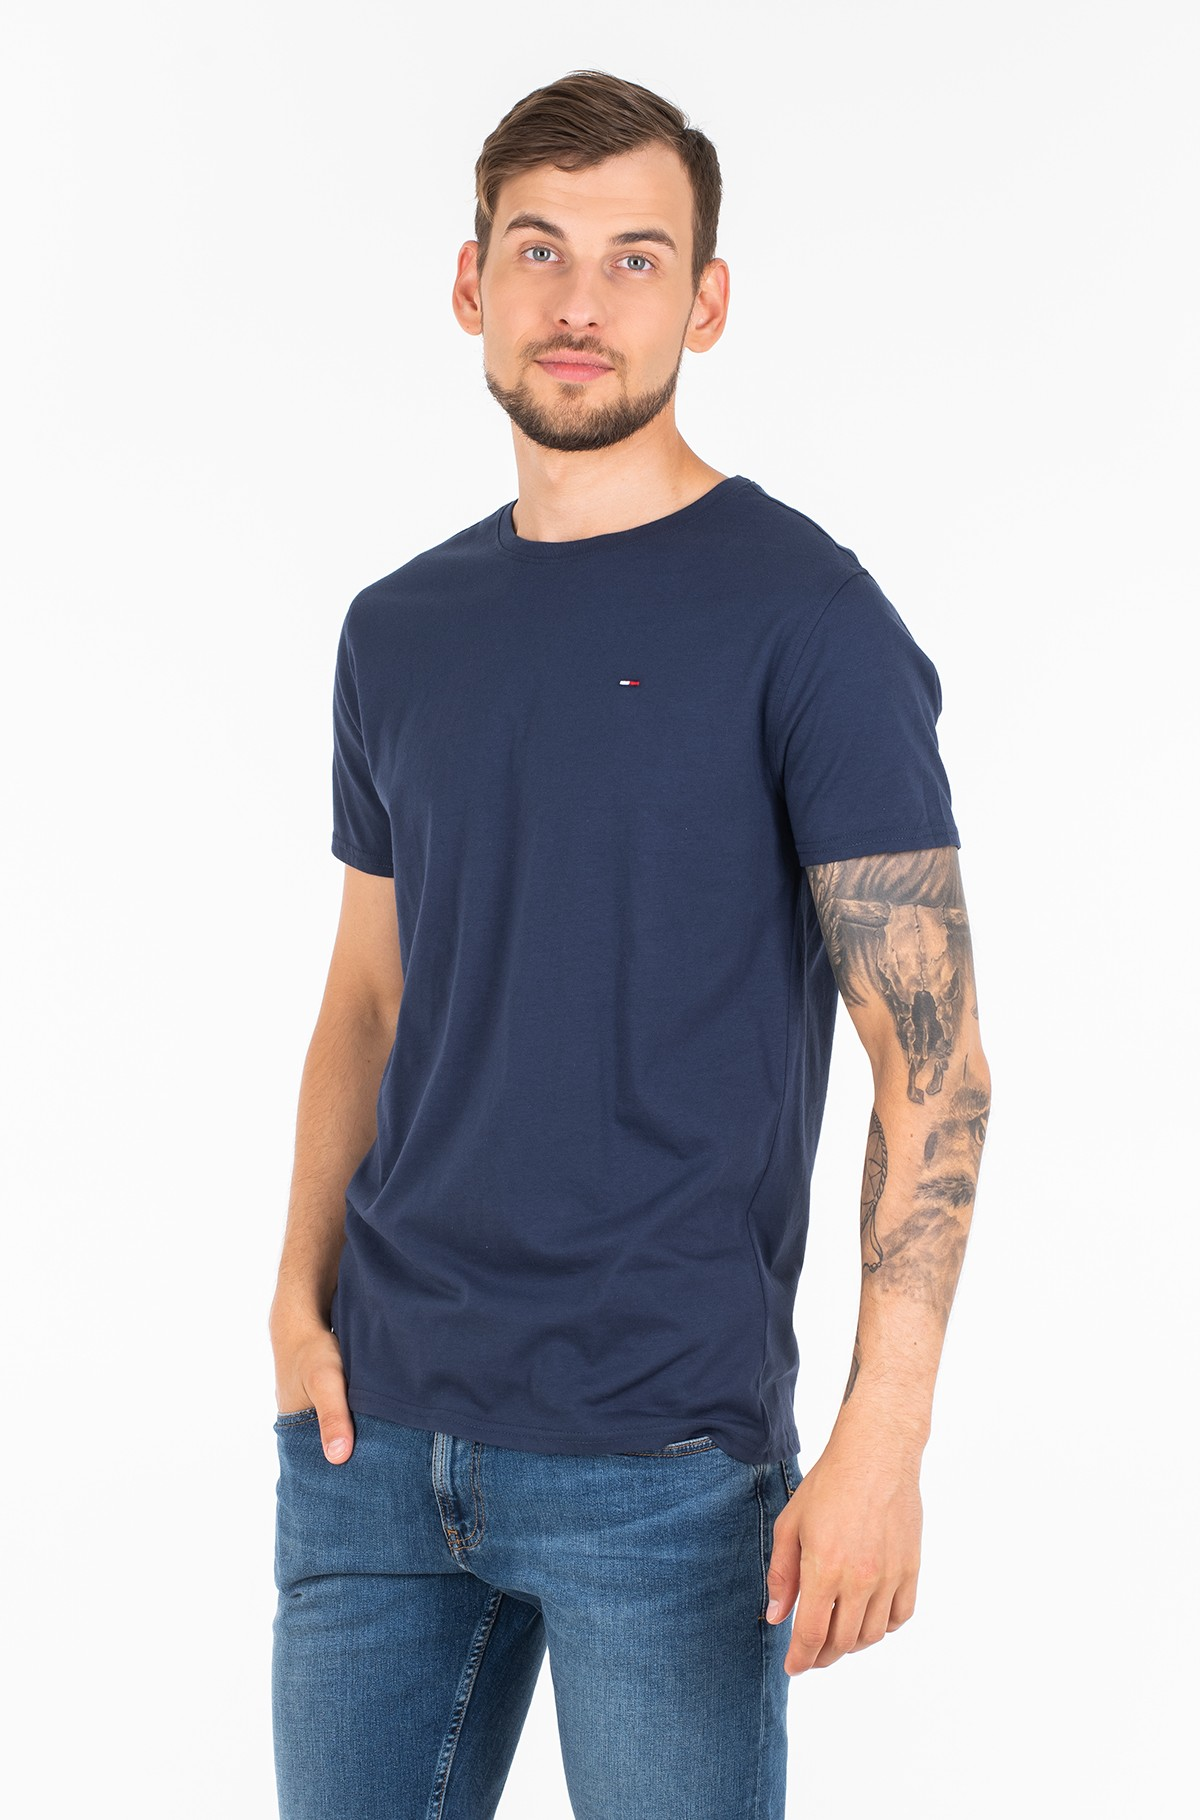 T-shirt TJM ORIGINAL JERSEY TEE-full-1